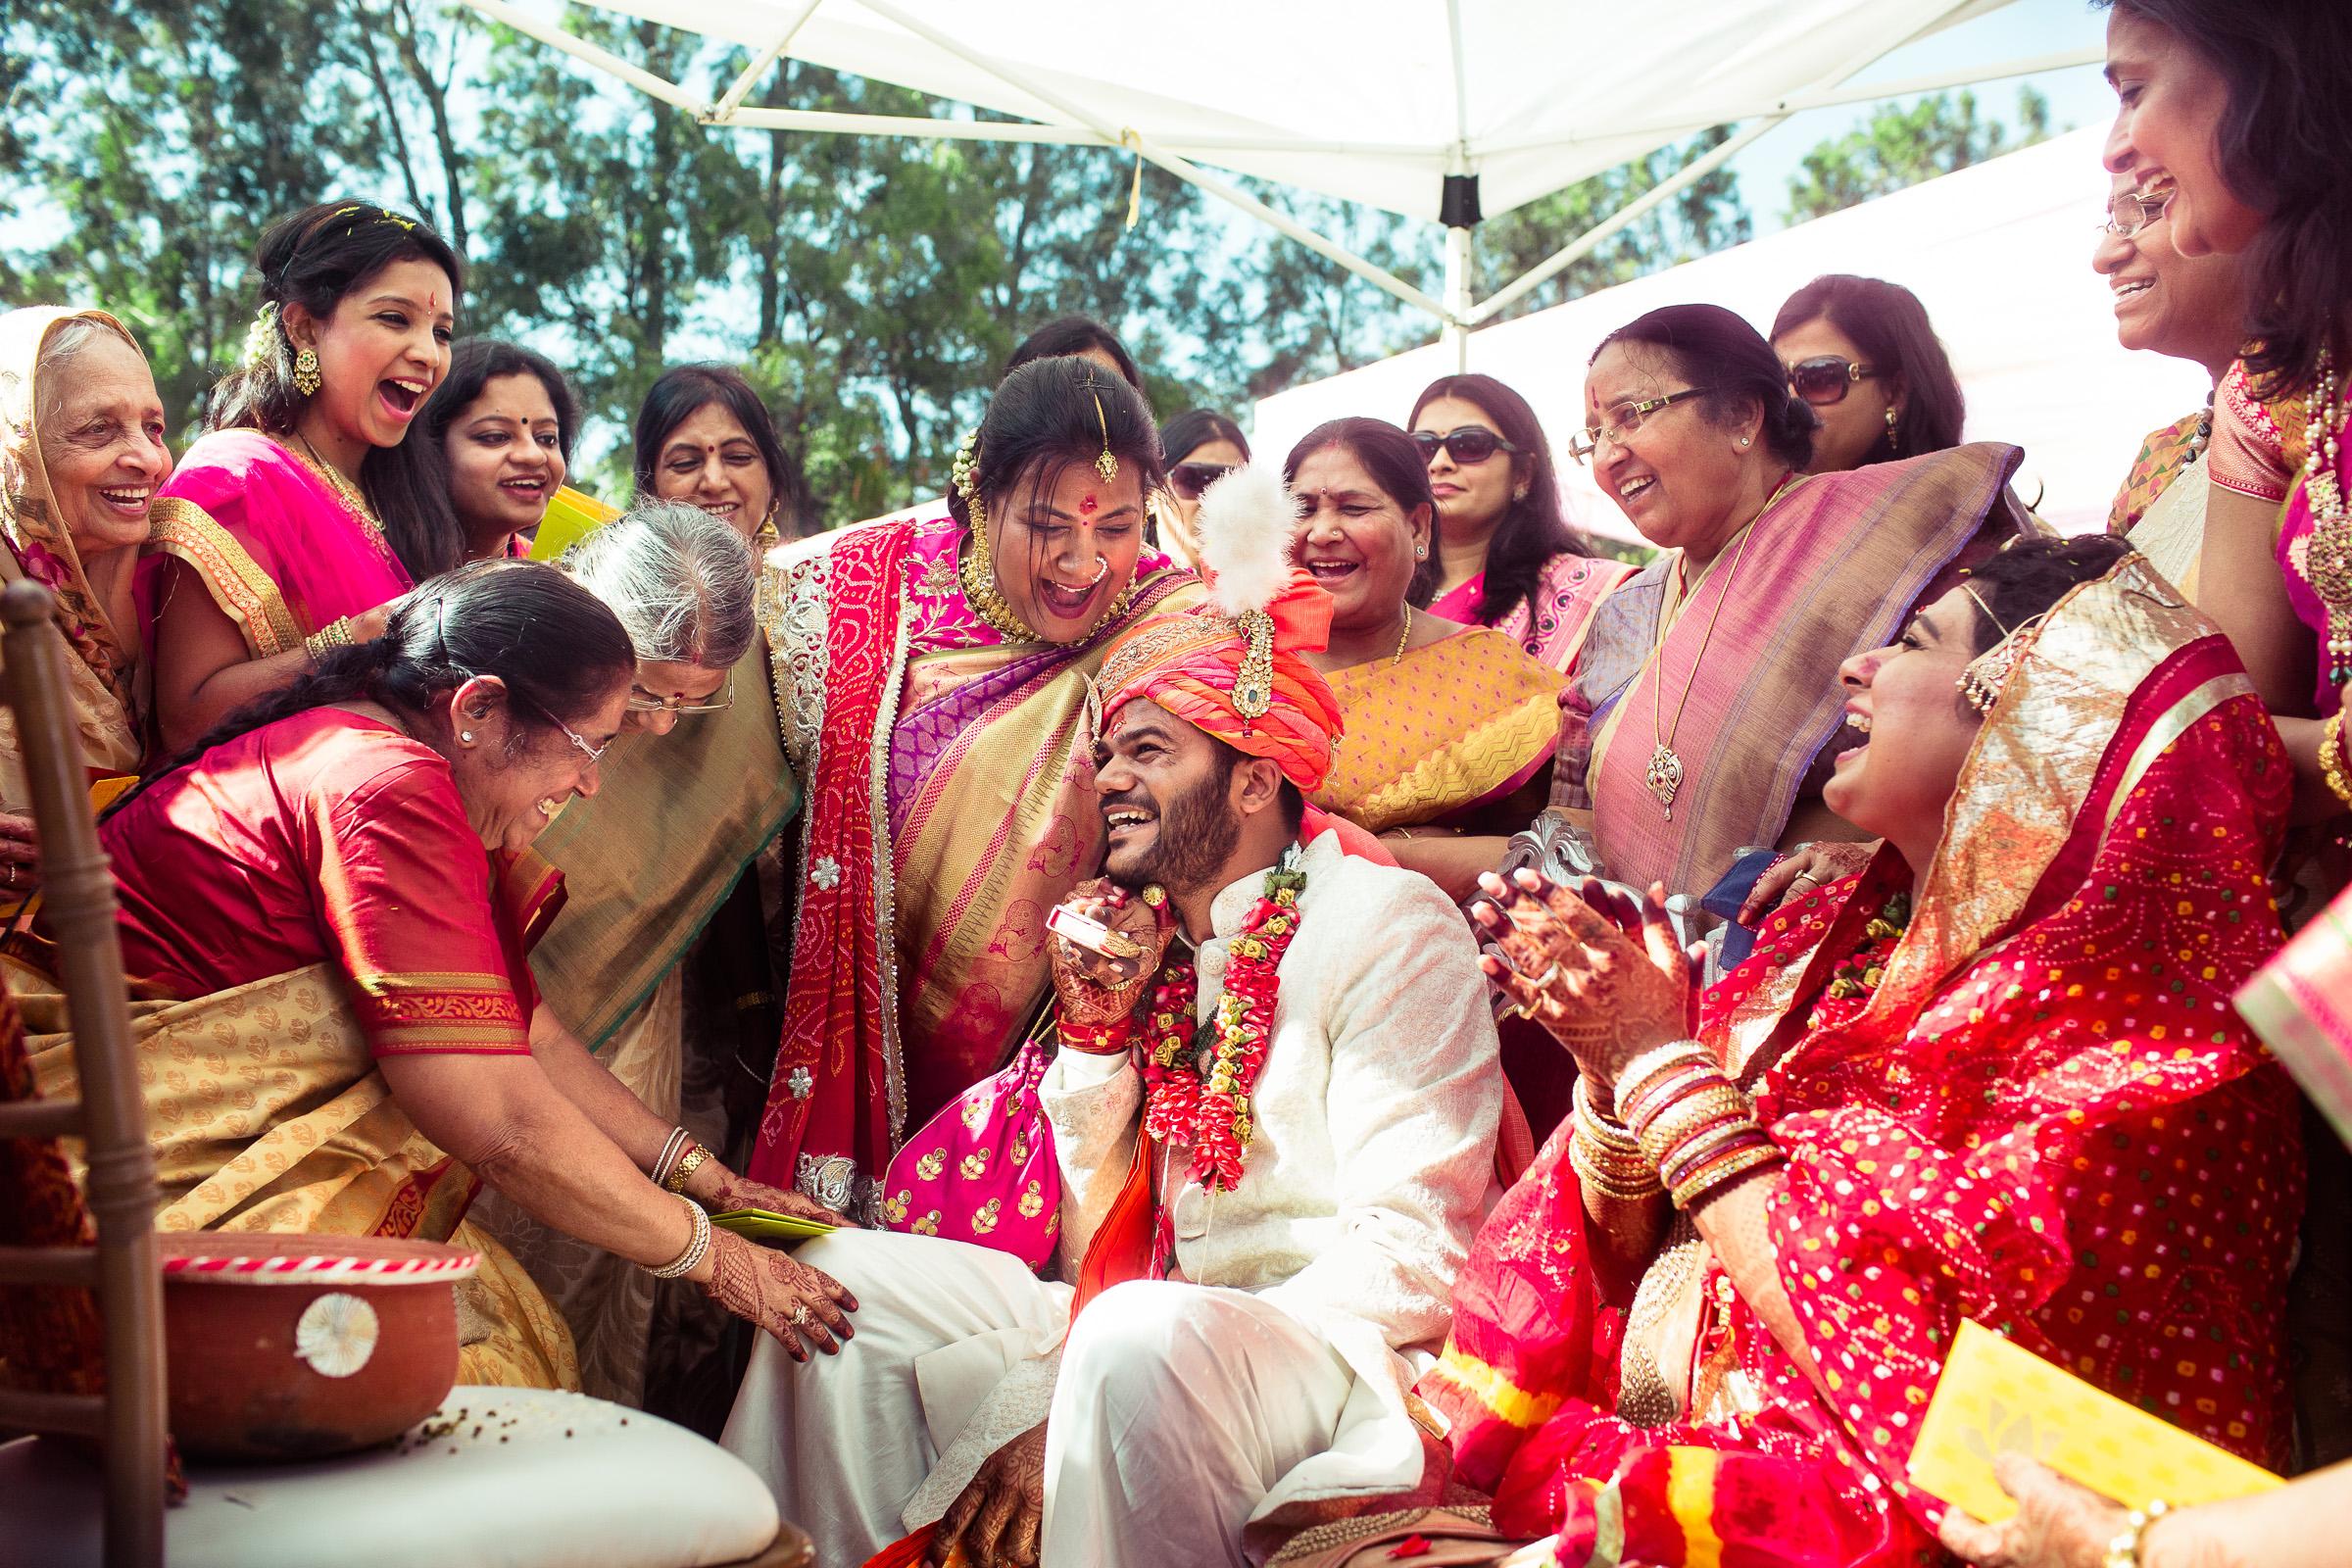 marwari-candid-wedding-photographers-bangalore-0047.jpg